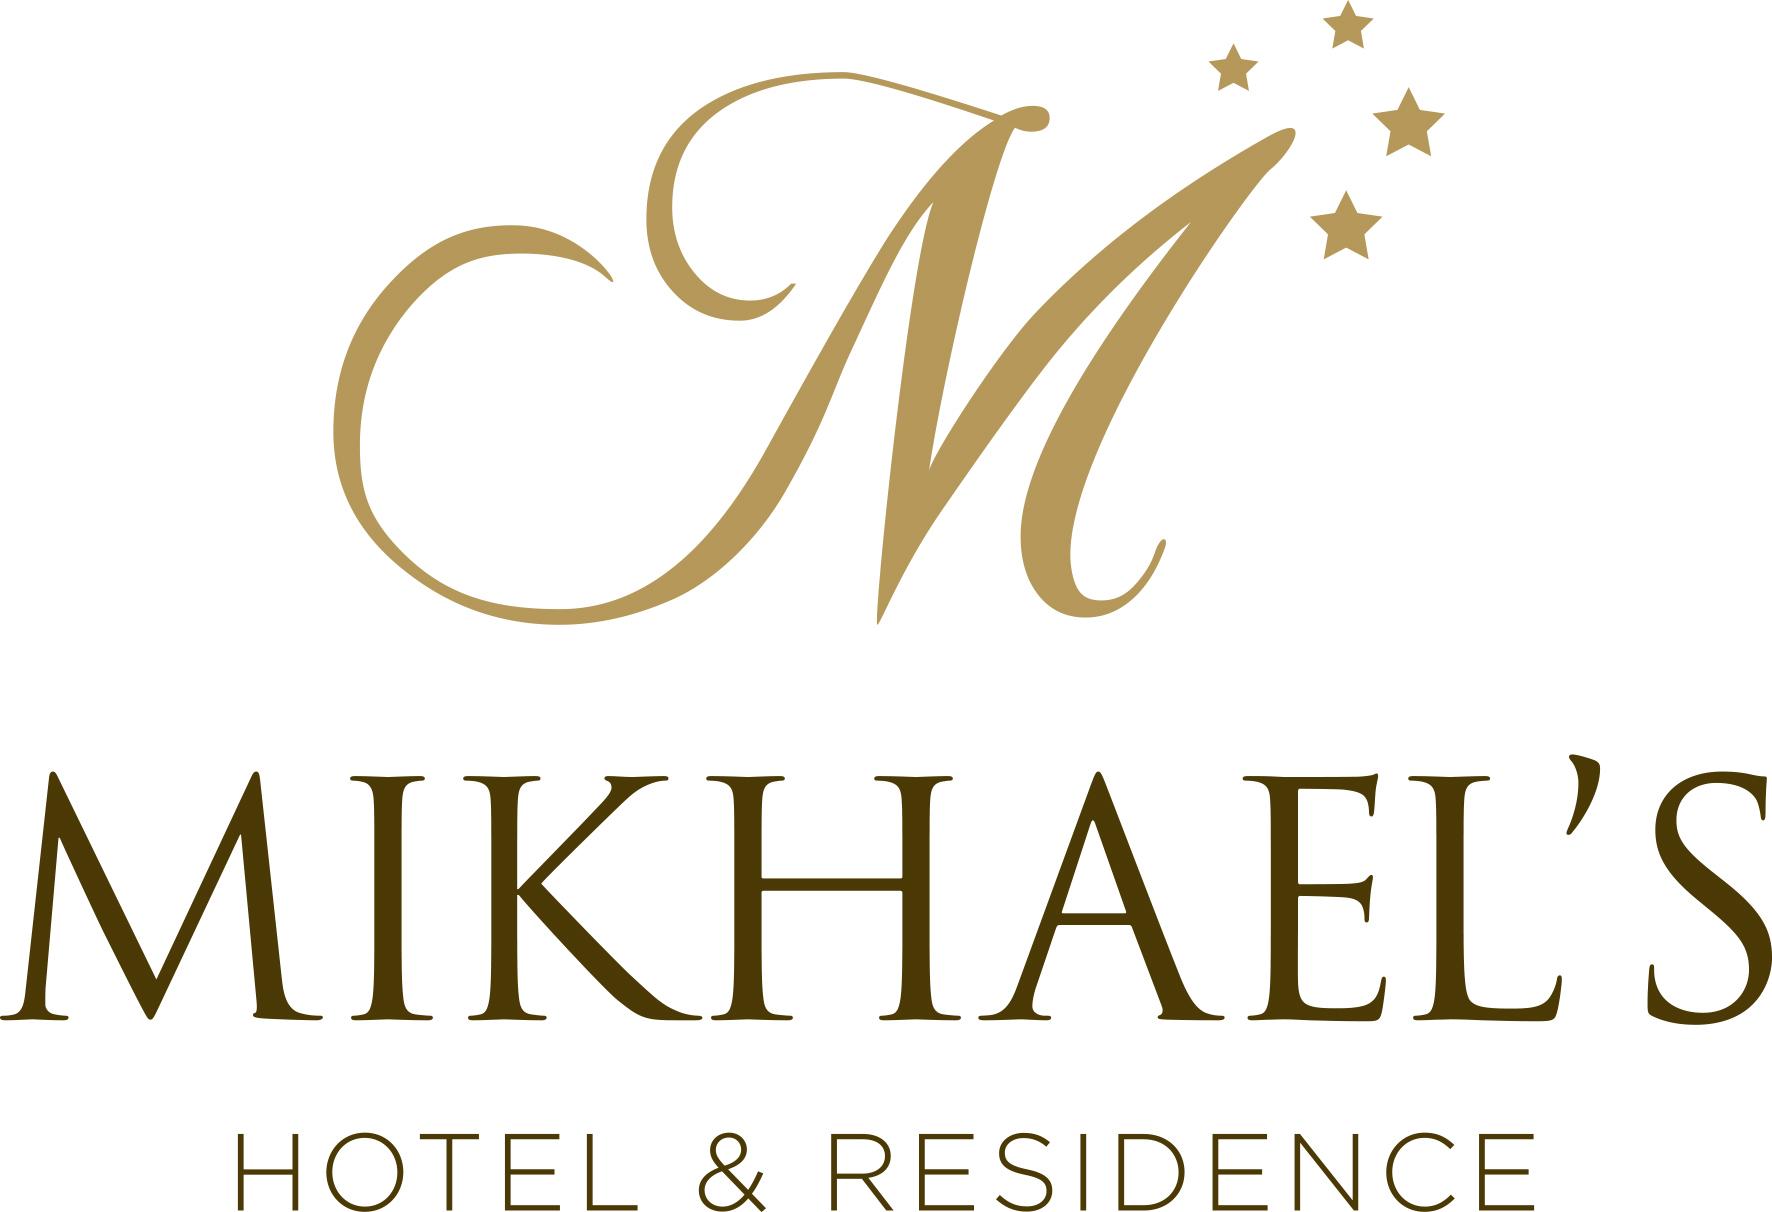 Mikhael's Hotel & Residence